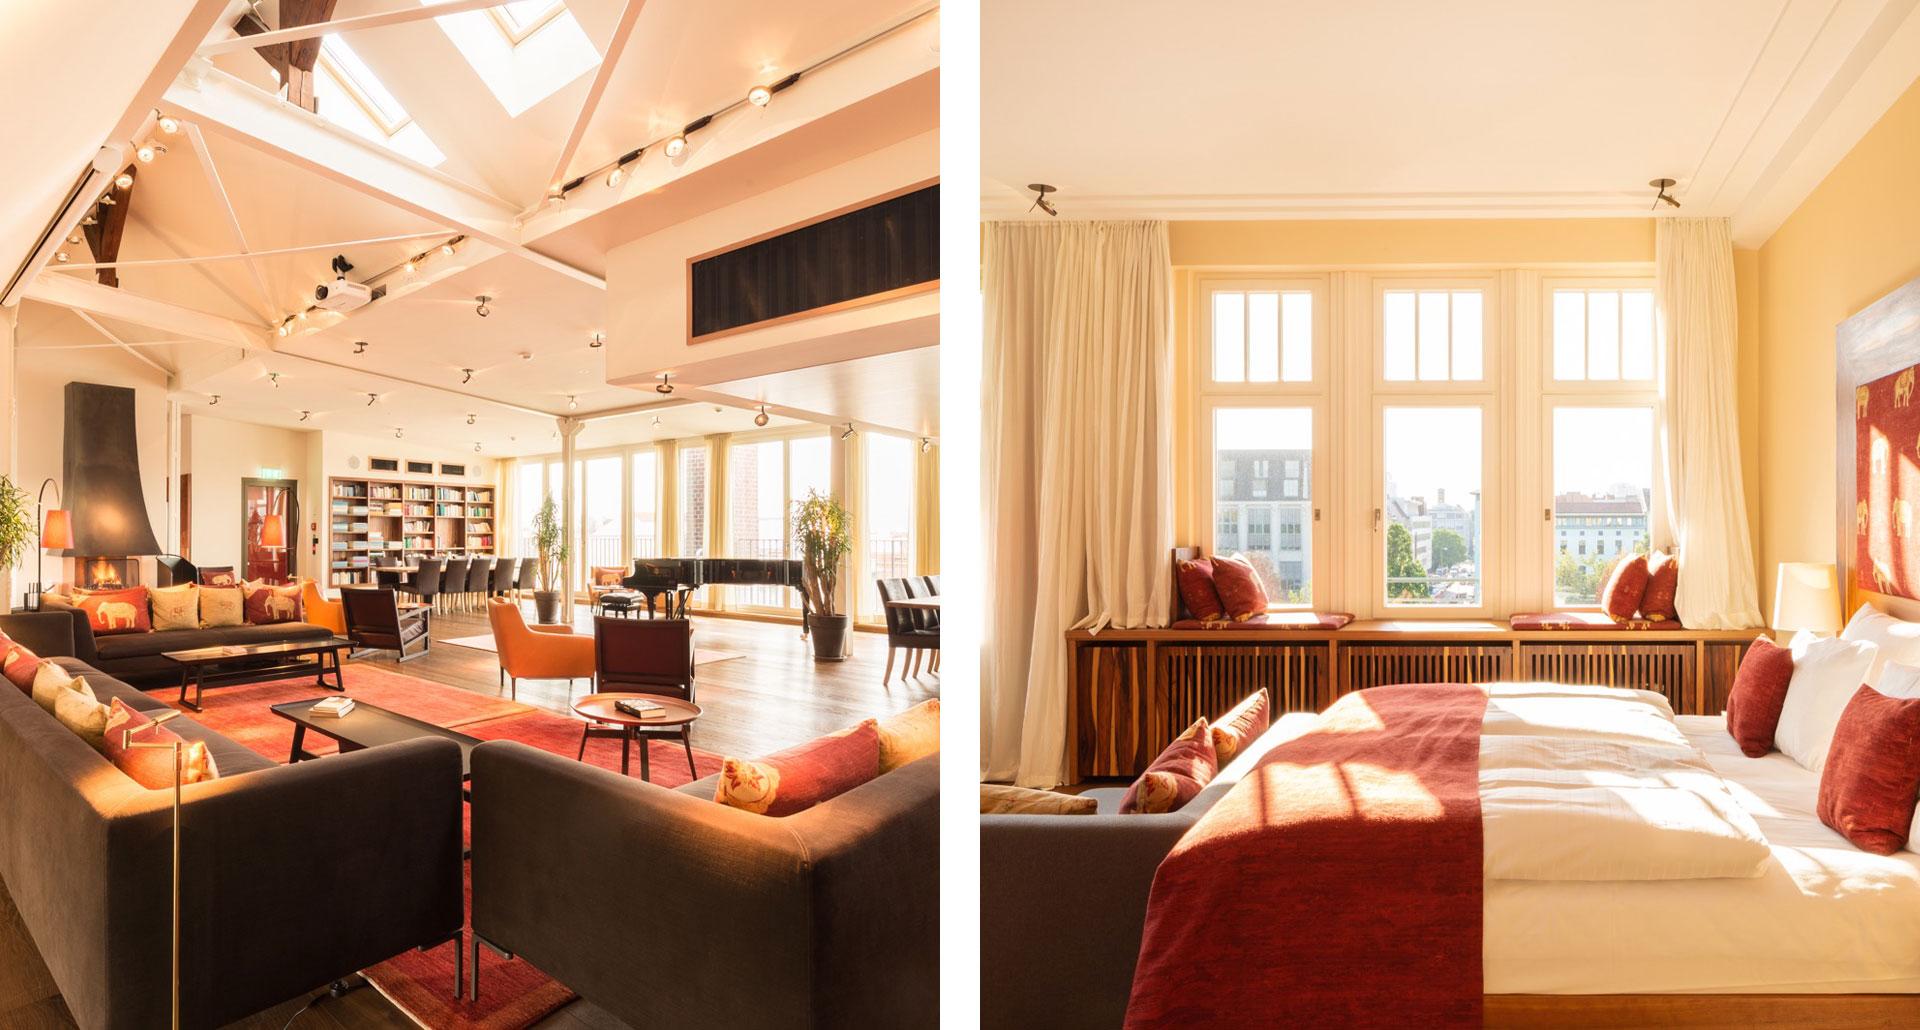 Hotel Orania.Berlin - boutique hotel in Berlino